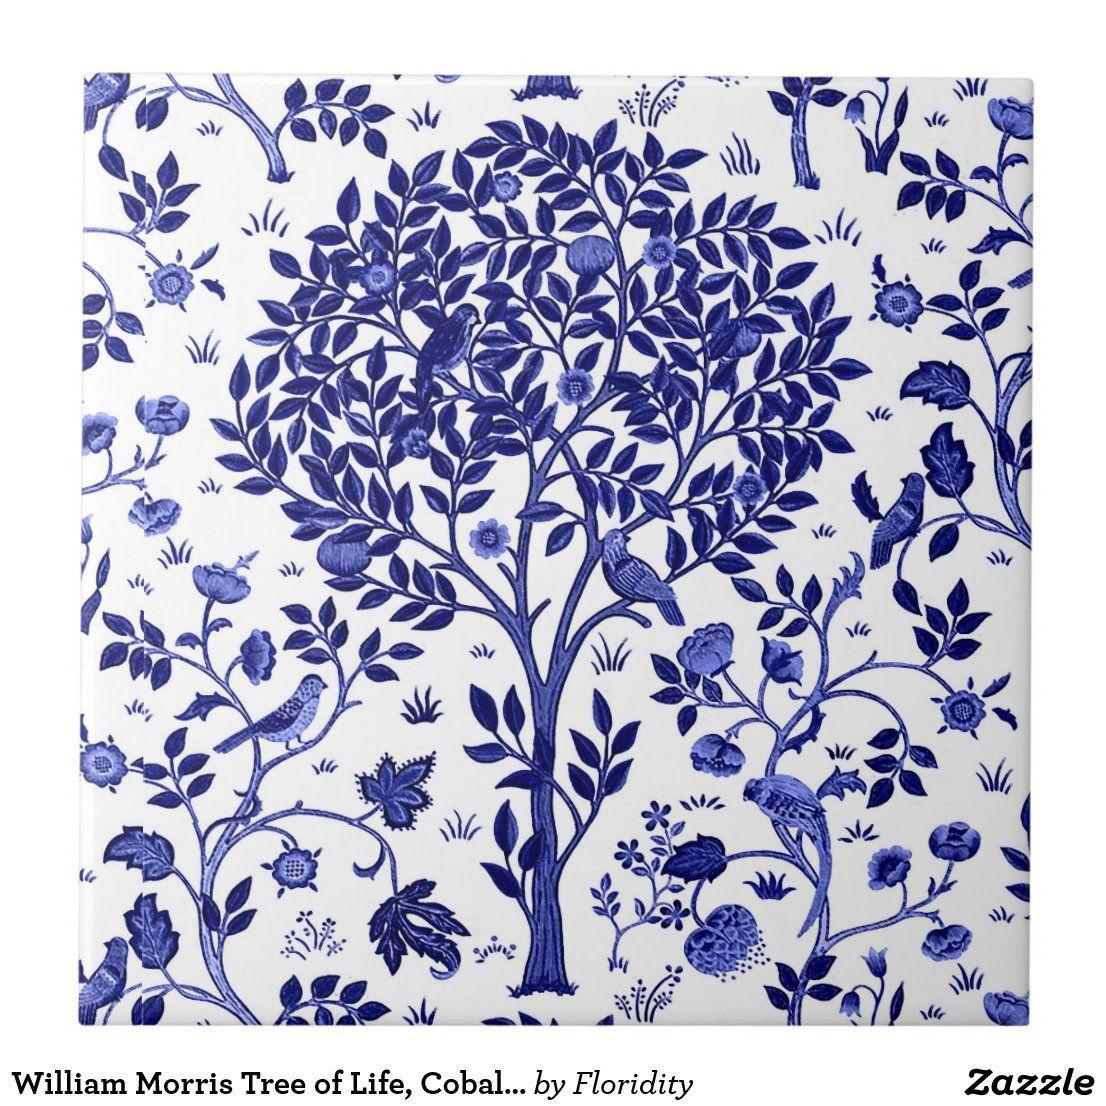 William Morris Tree Of Life Cobalt Blue And White Ceramic Tile Zazzle Com Blue And White Wallpaper White Ceramic Tiles Blue And White Fabric